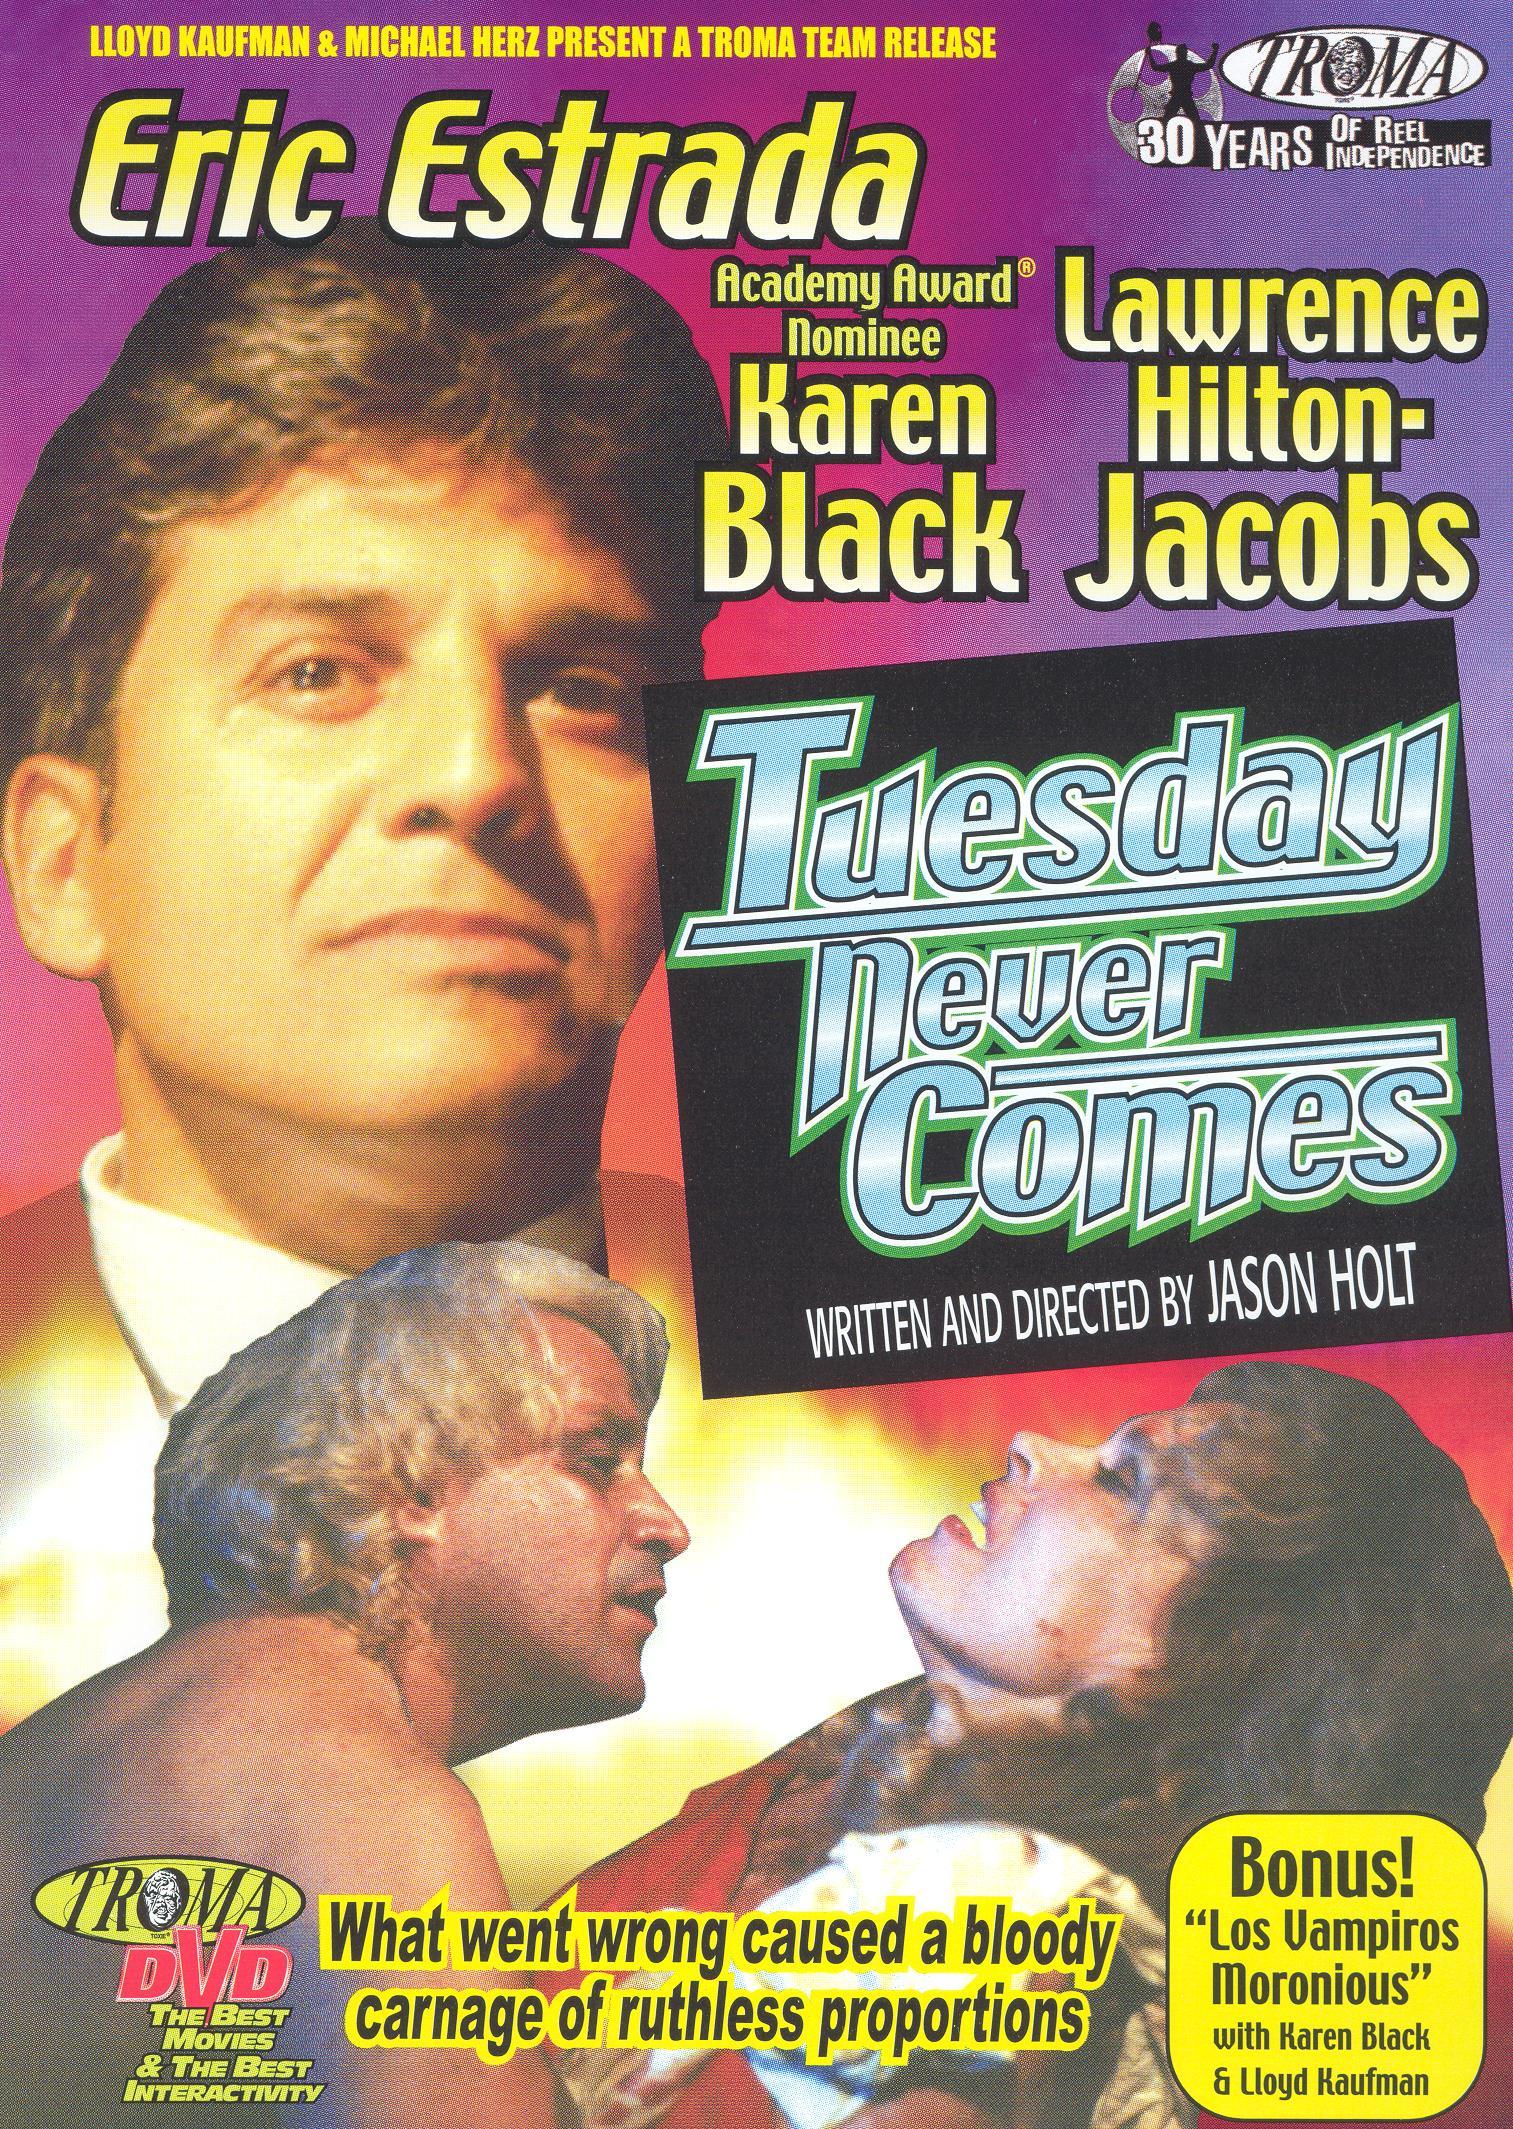 Tuesday Never Comes